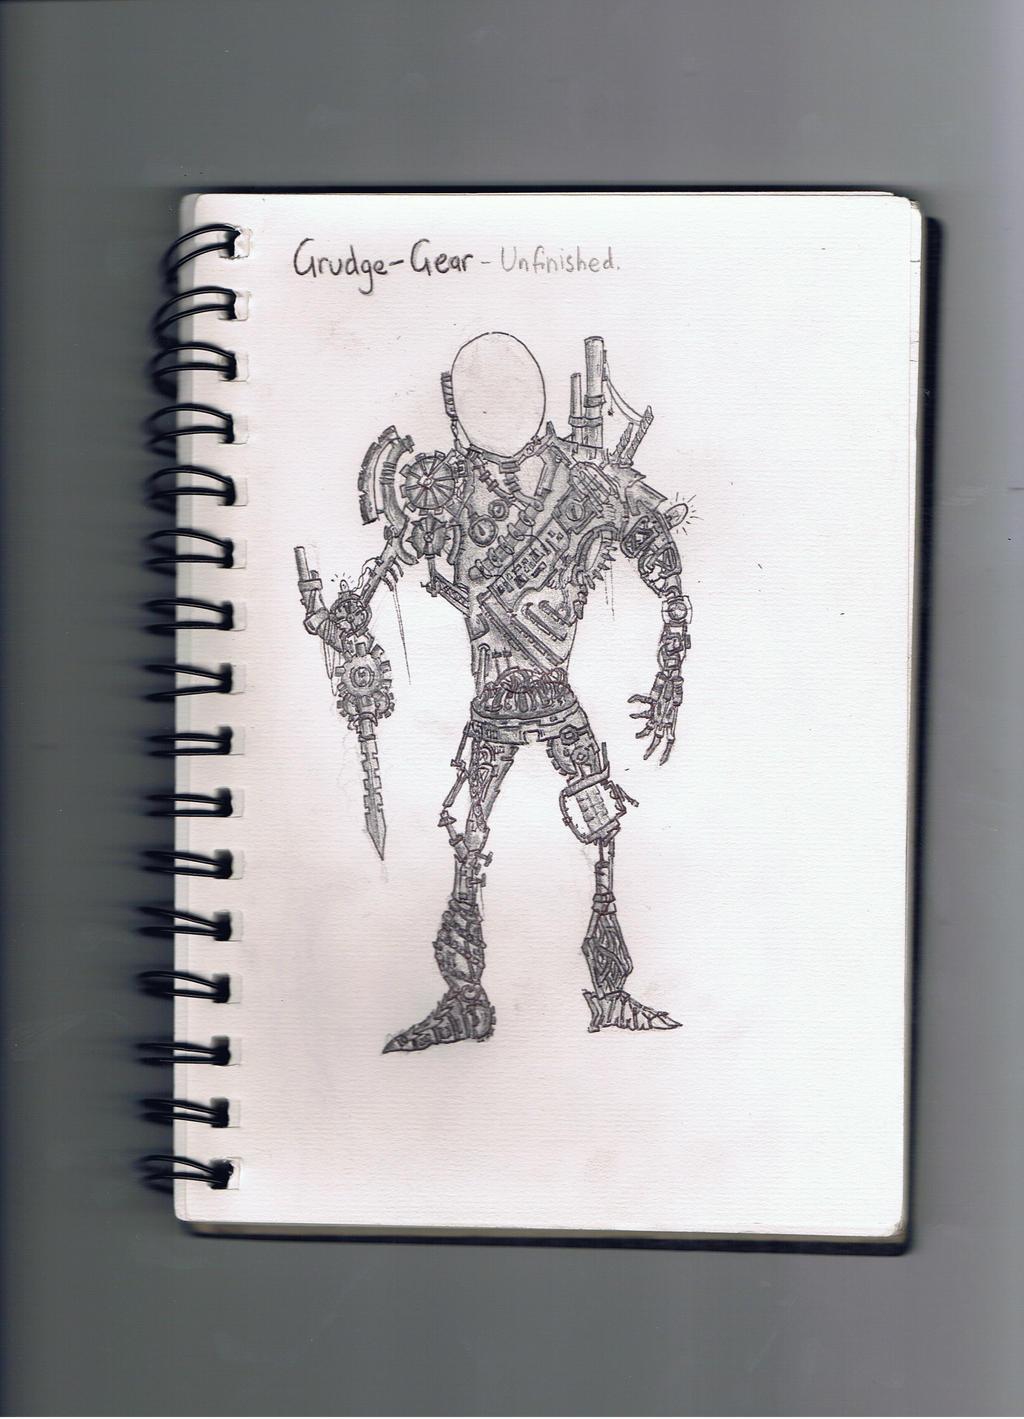 SketchBook Drawings 6- Steampunk Grudge Robot by Pyrovilekiller